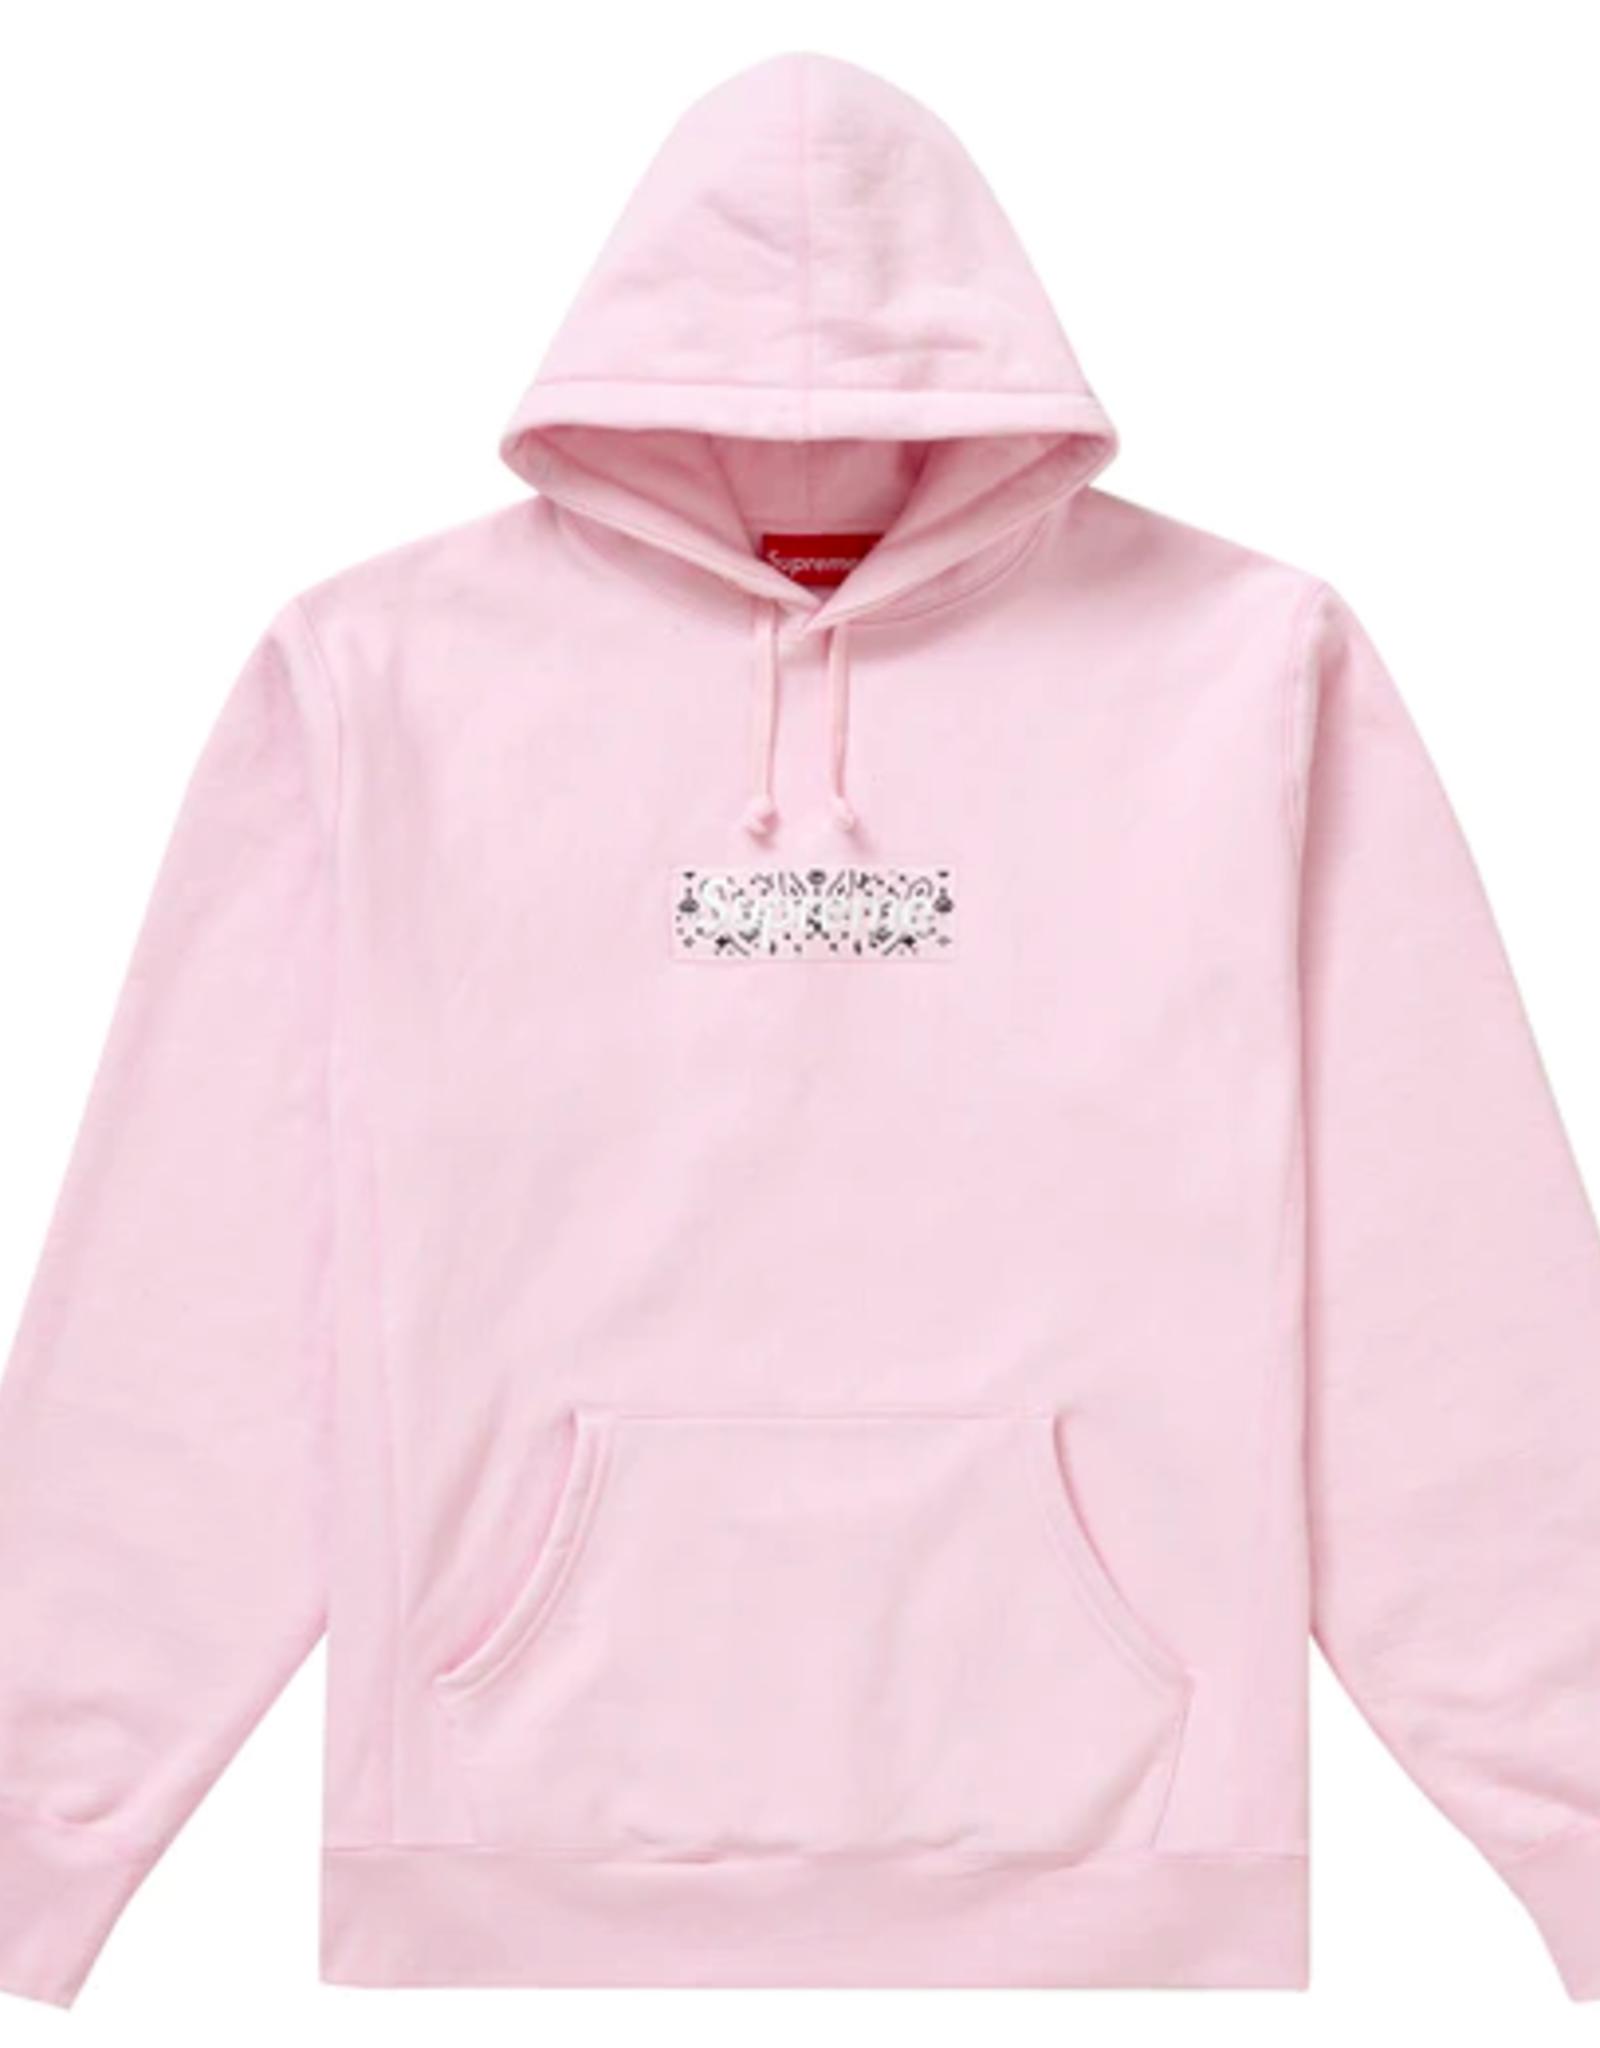 SUPREME Supreme Bandana Box Logo Hooded Sweatshirt Pink - XL